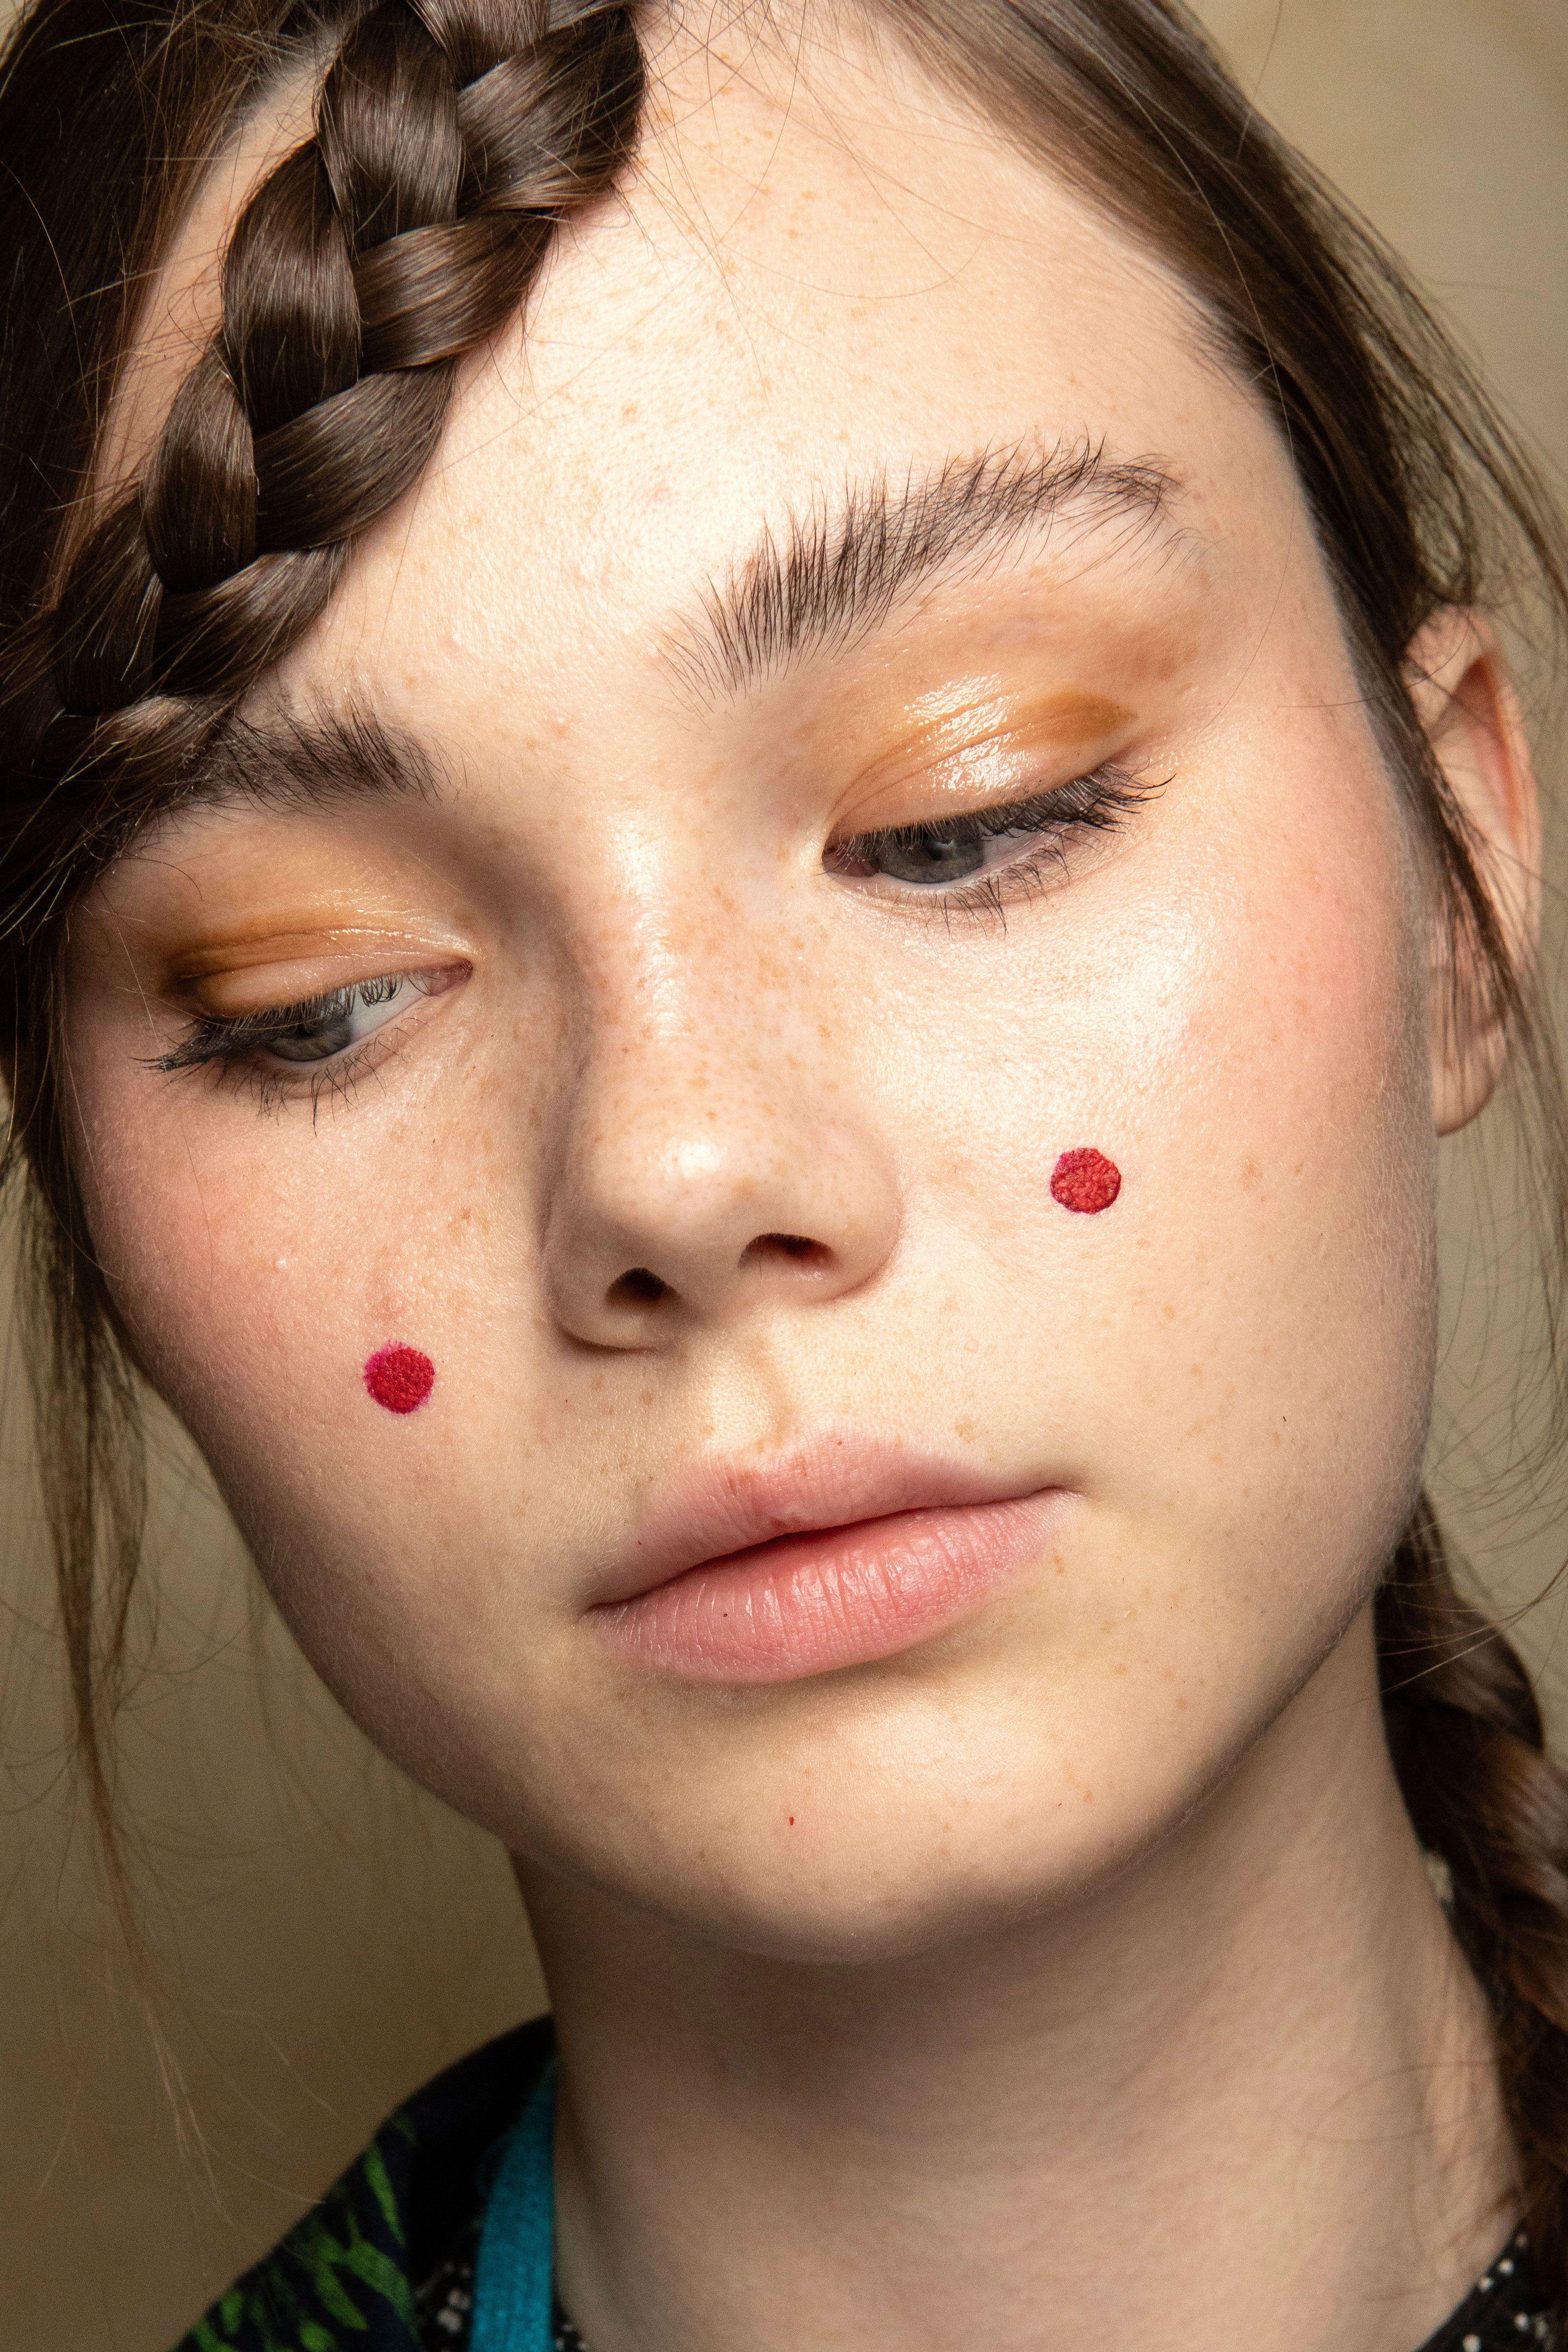 The 12 Best Eczema Treatments, According to Three Dermatologists